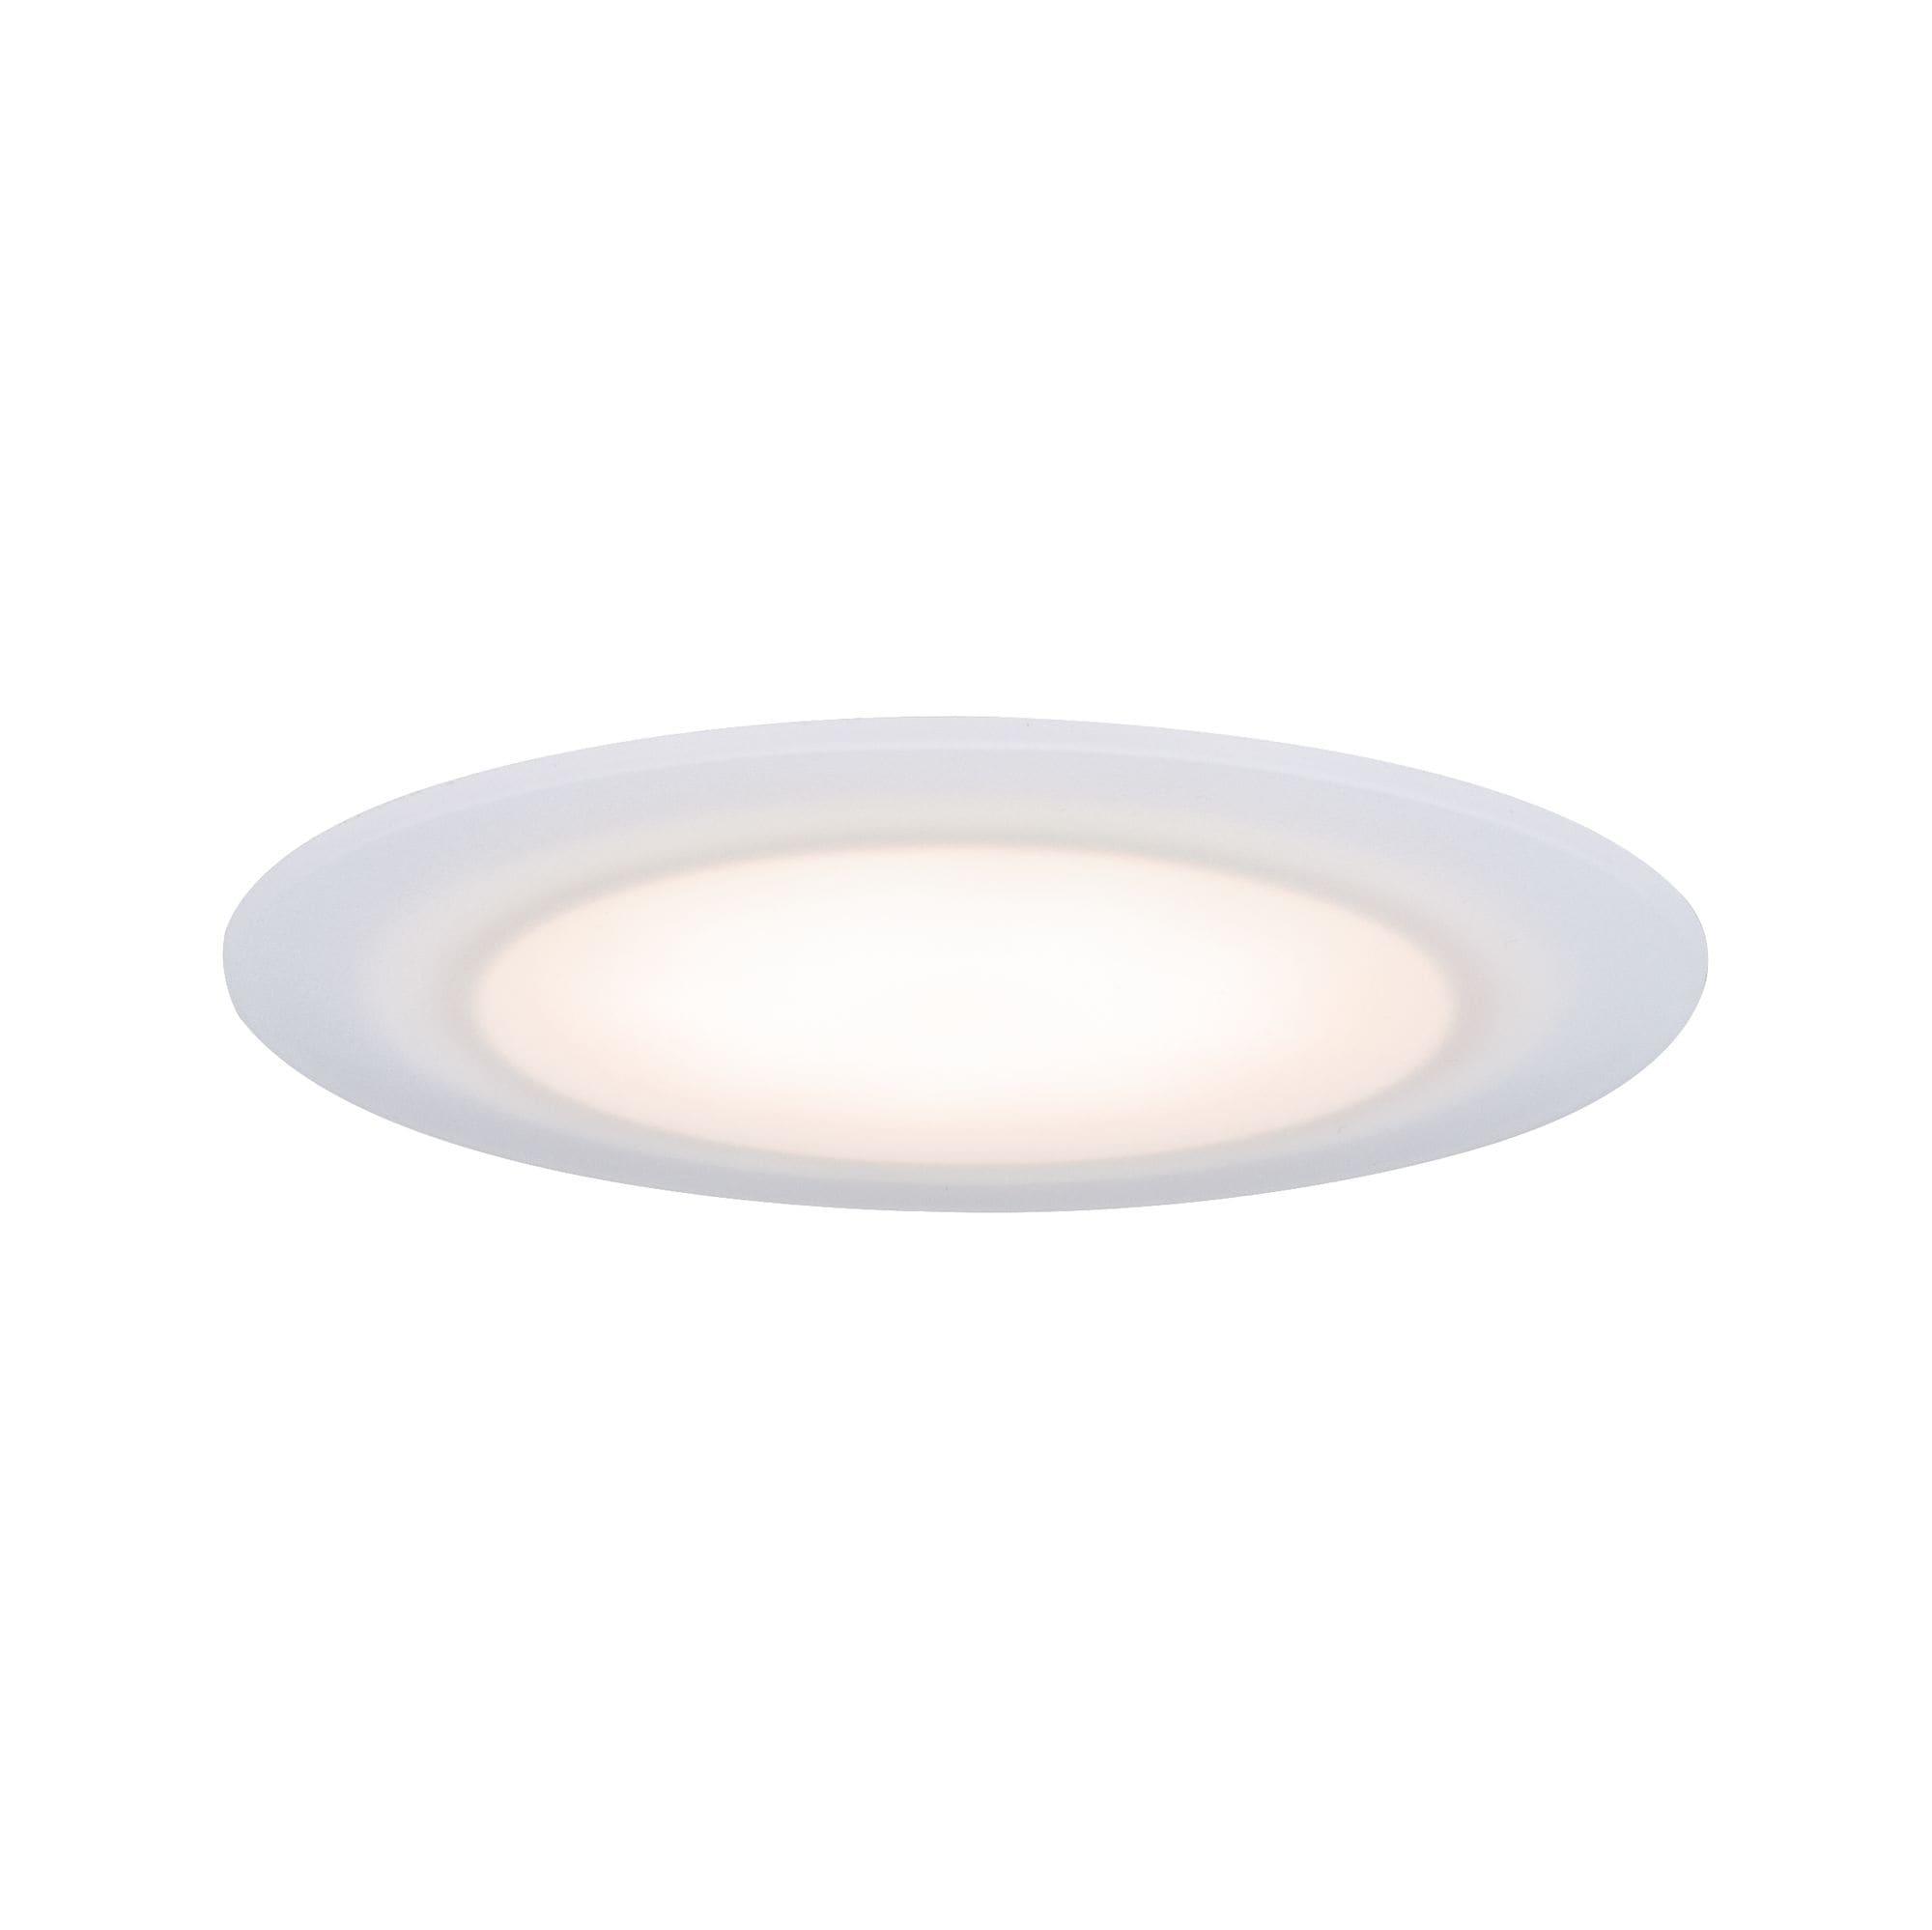 Paulmann LED Einbaustrahler Suon dimmbar 2700K 6,5W 230 V Satiniert, 1 St., Warmweiß